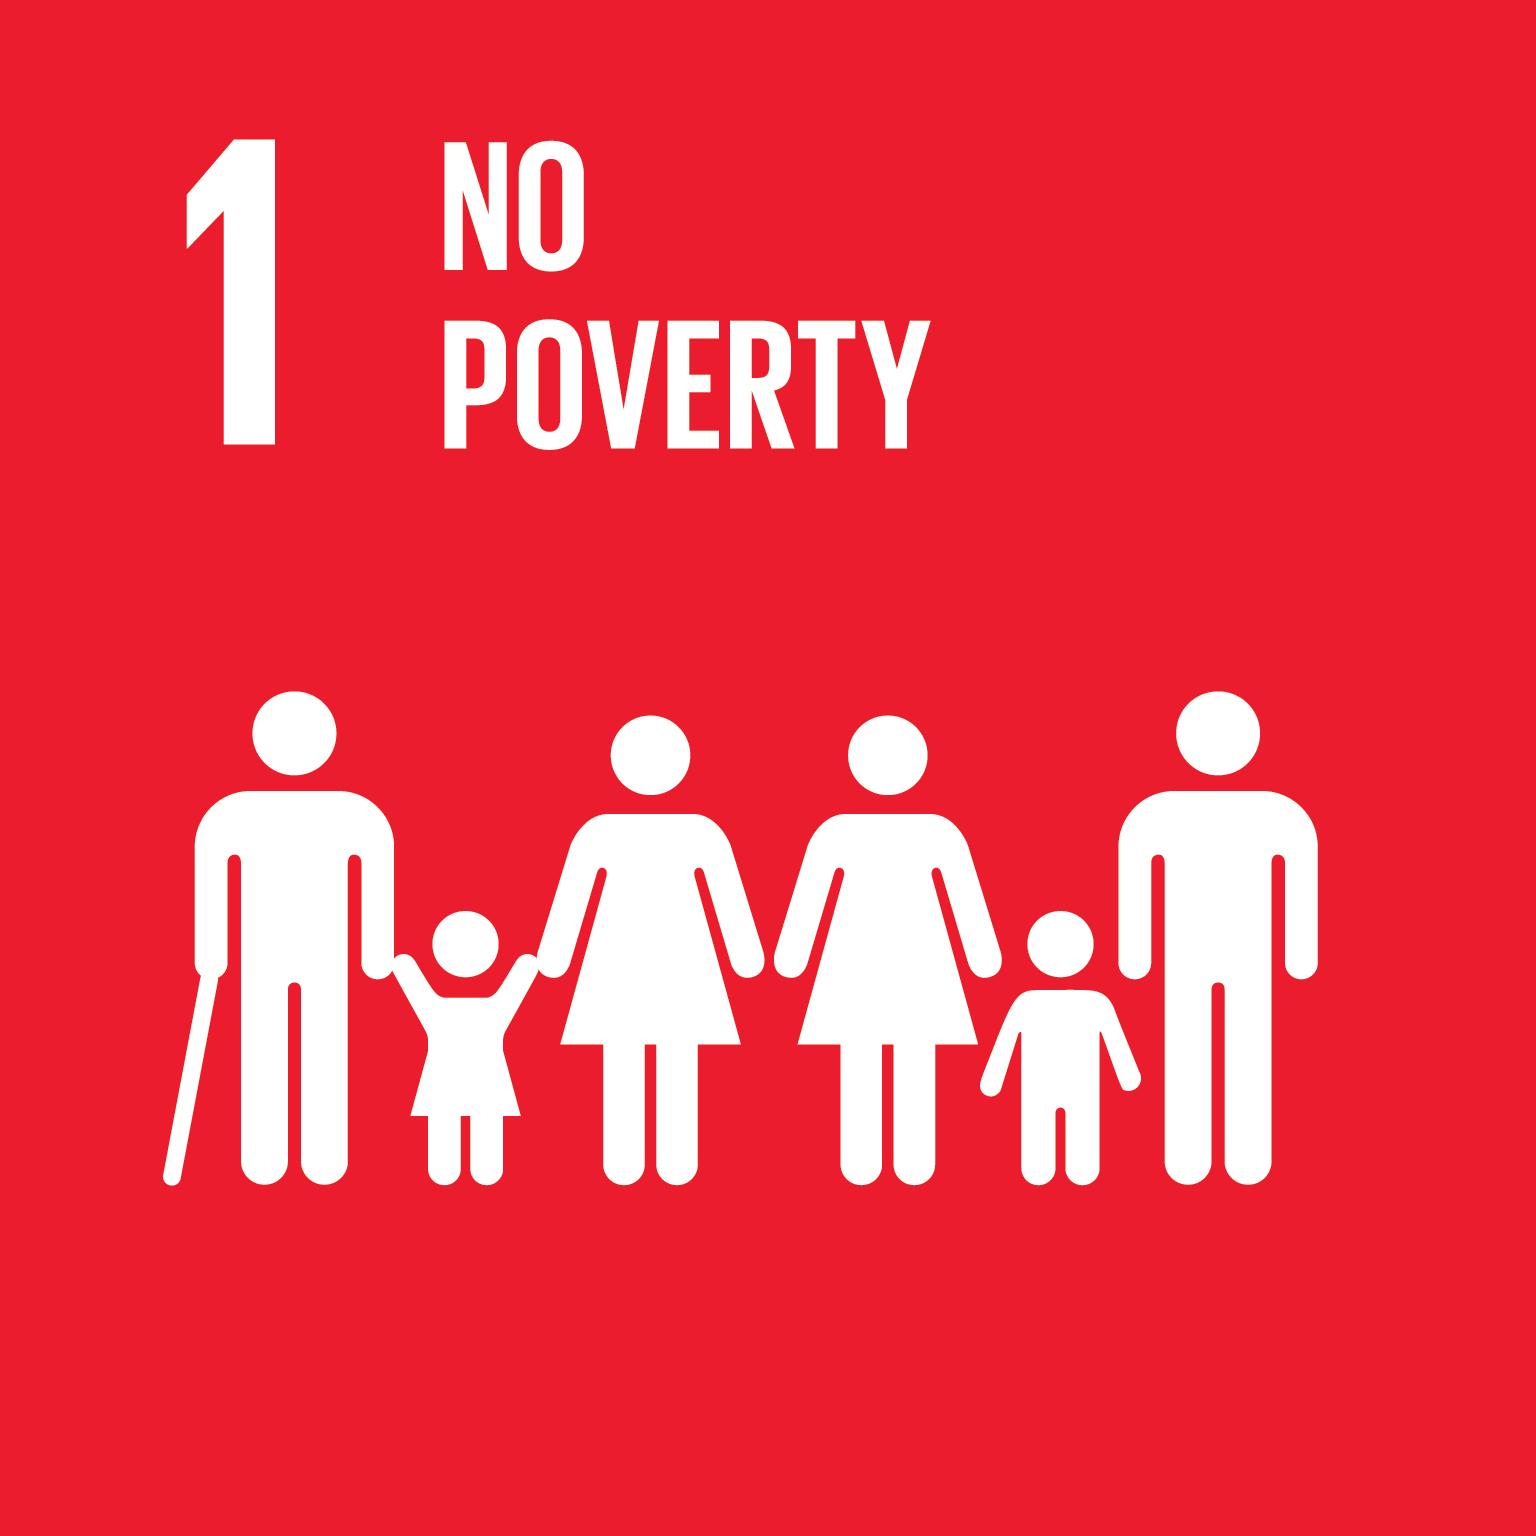 UN Sustainable Development Goals - 01 - No Poverty